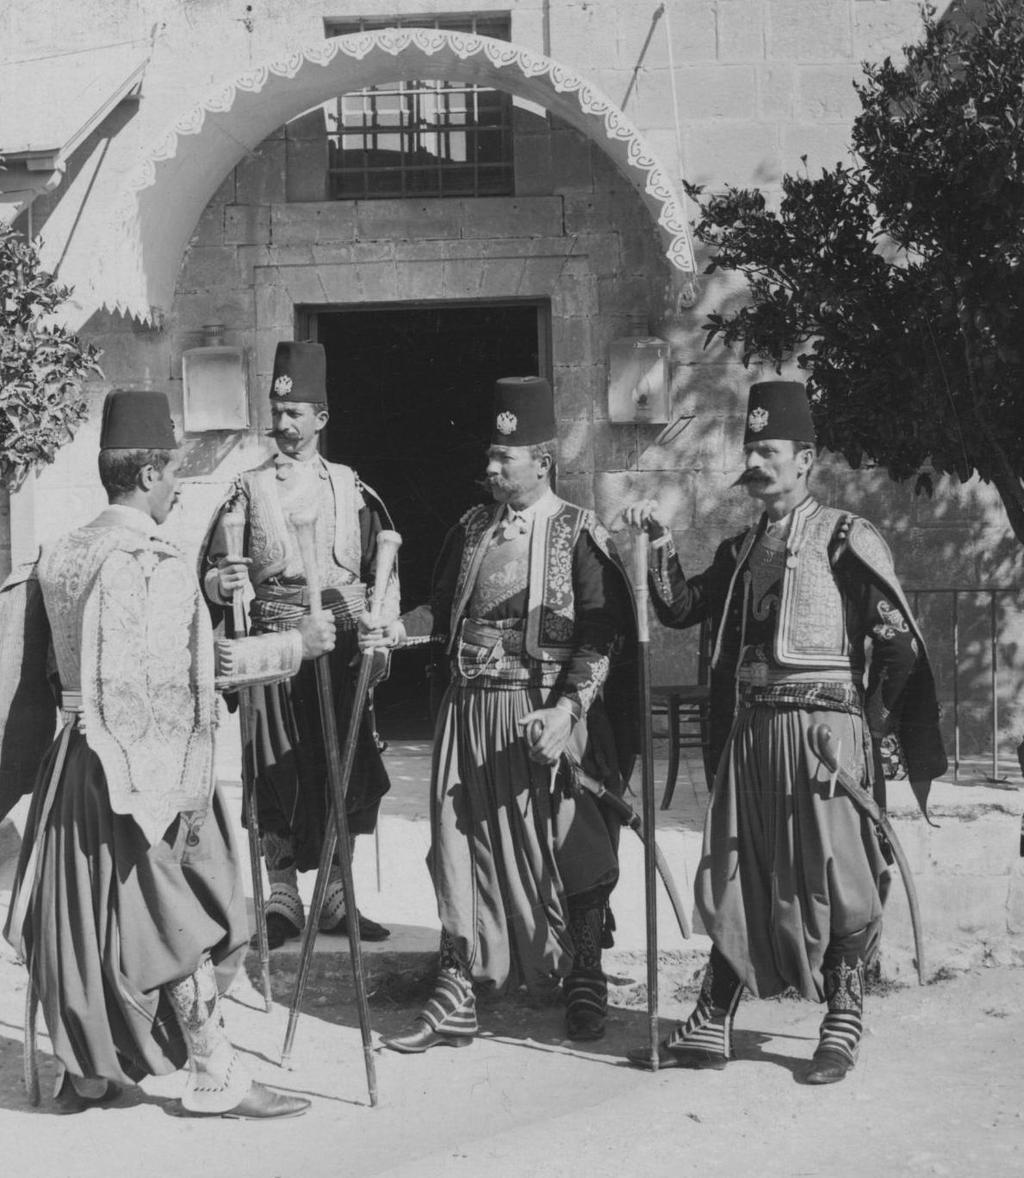 [Ottoman Empire] Kavas (Guard), Military Officers in Jerusalem, Palestine, 1890s (Osmanlı Dönemi Kudüs'de Kavaslar)